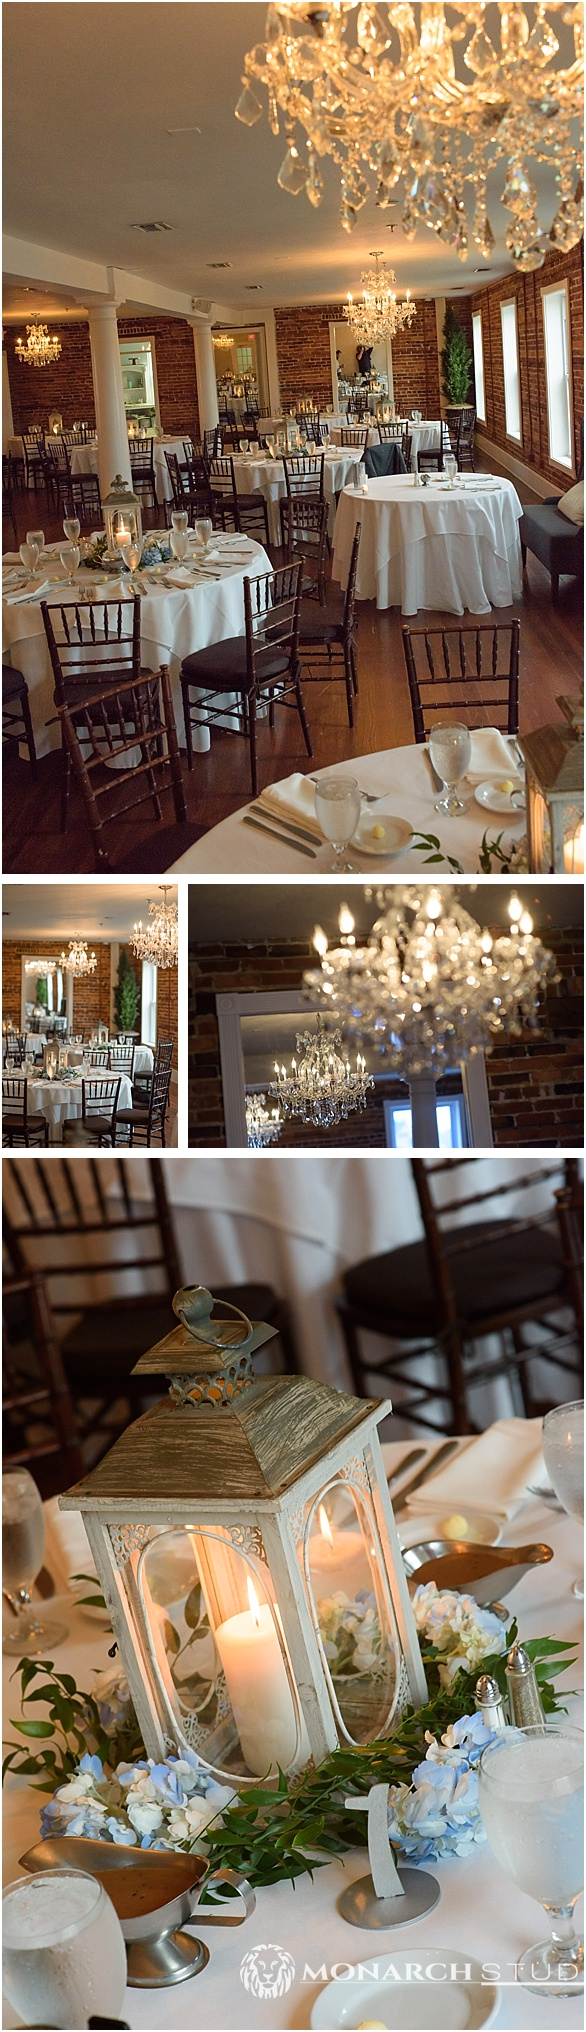 white-room-wedding-photographer-st-augustine-047.jpg